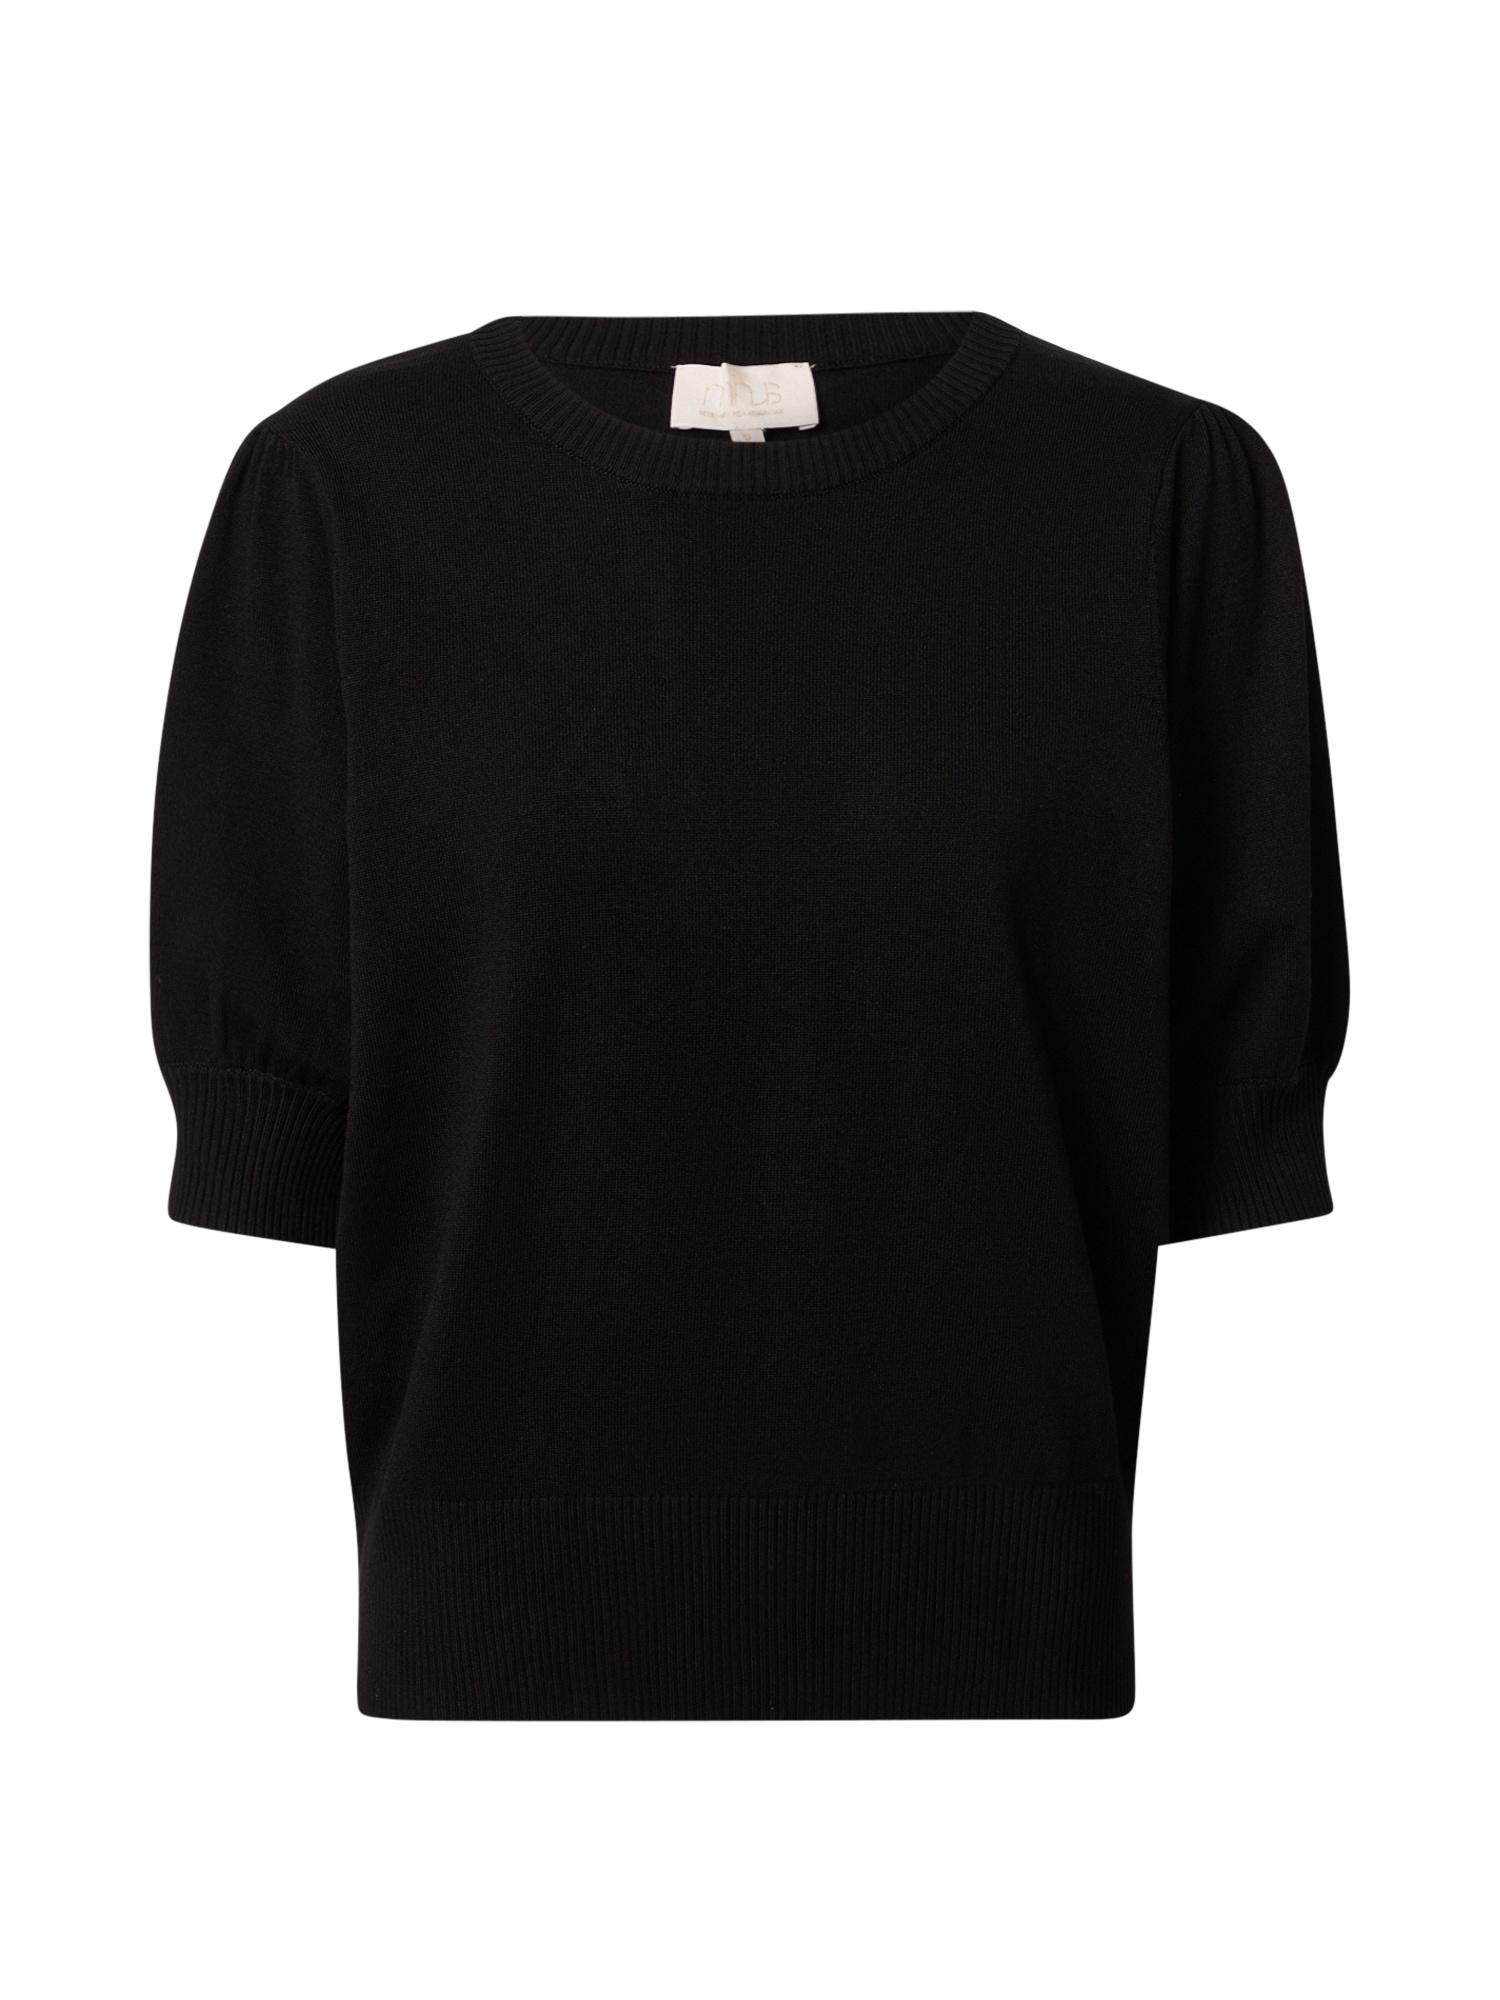 minus Megztinis juoda